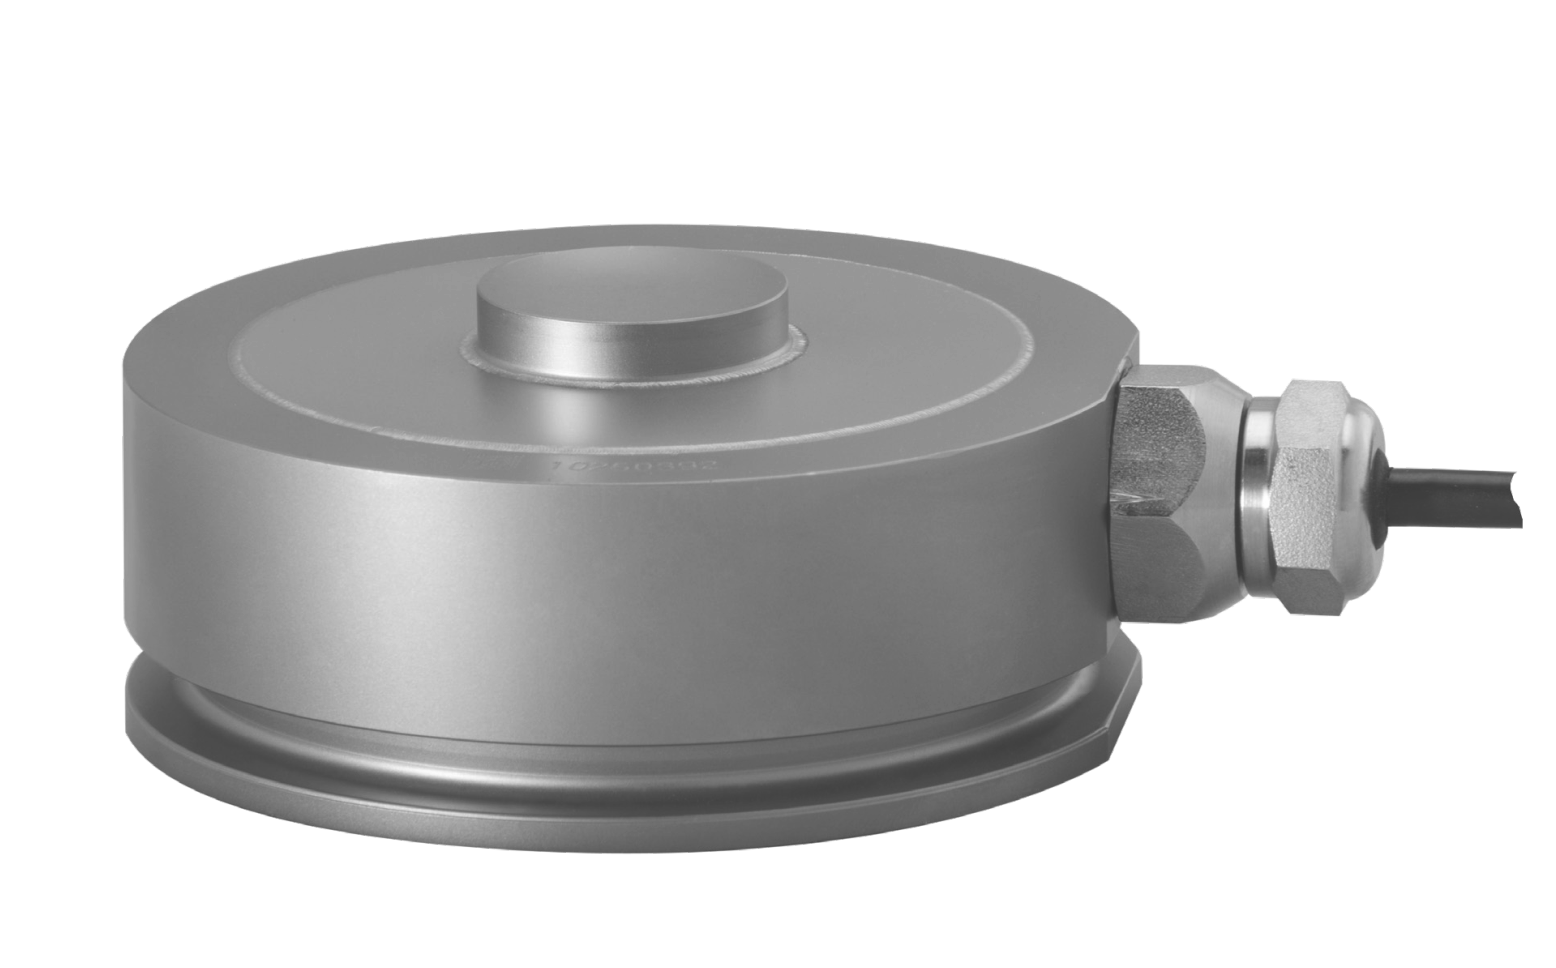 Load Cell Q50 Sensor Techniques Limited